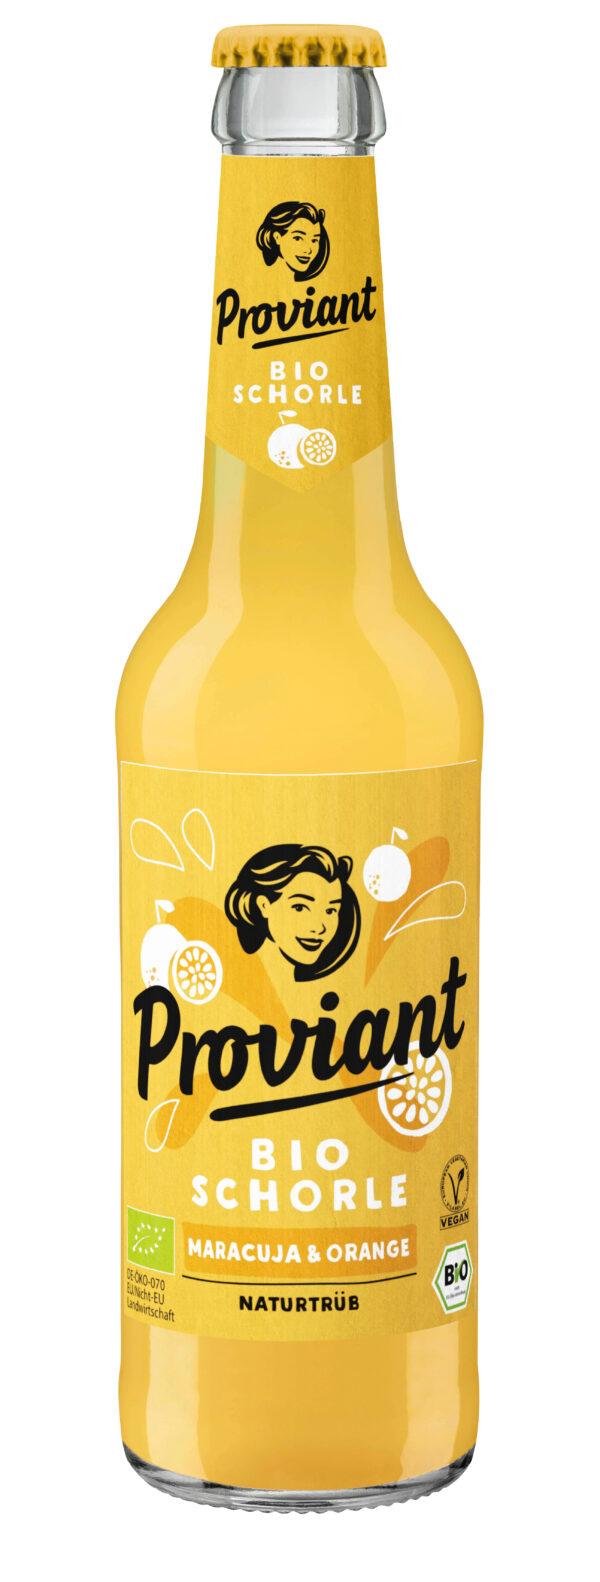 Proviant Berlin Schorle Maracuja & Orange (Bio) 330ml